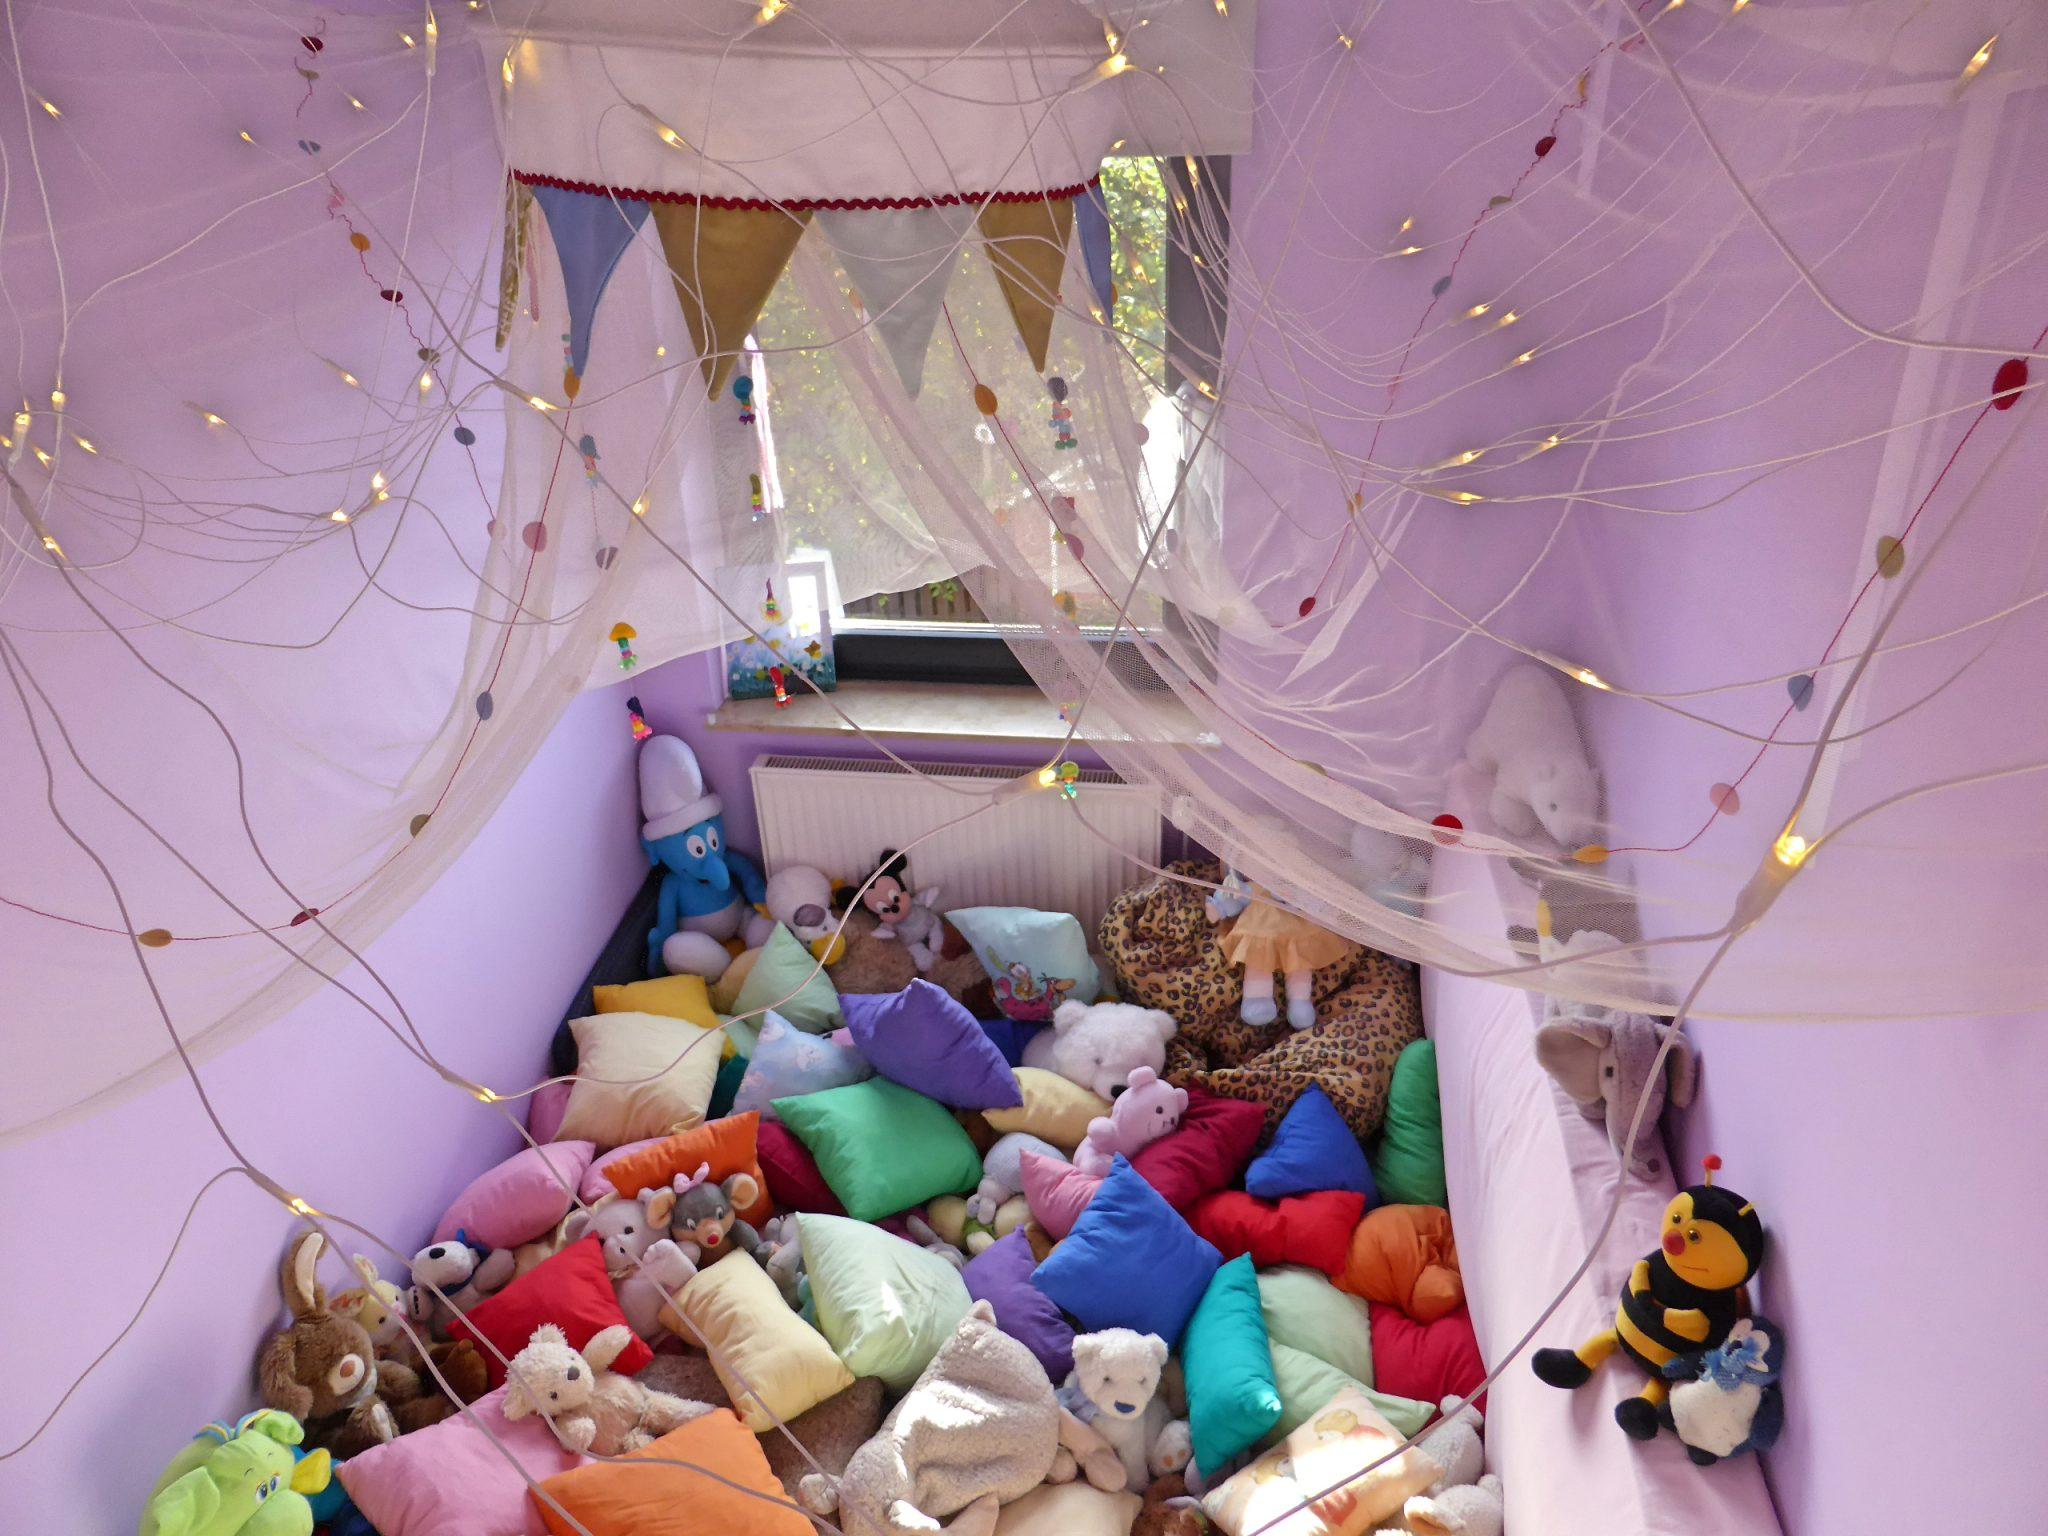 Snozzle 1 Kita Kid Zone Kinderbetreuung - Kita Kid Zone Kinderbetreuung für 0-3 Jahre in Jersbek